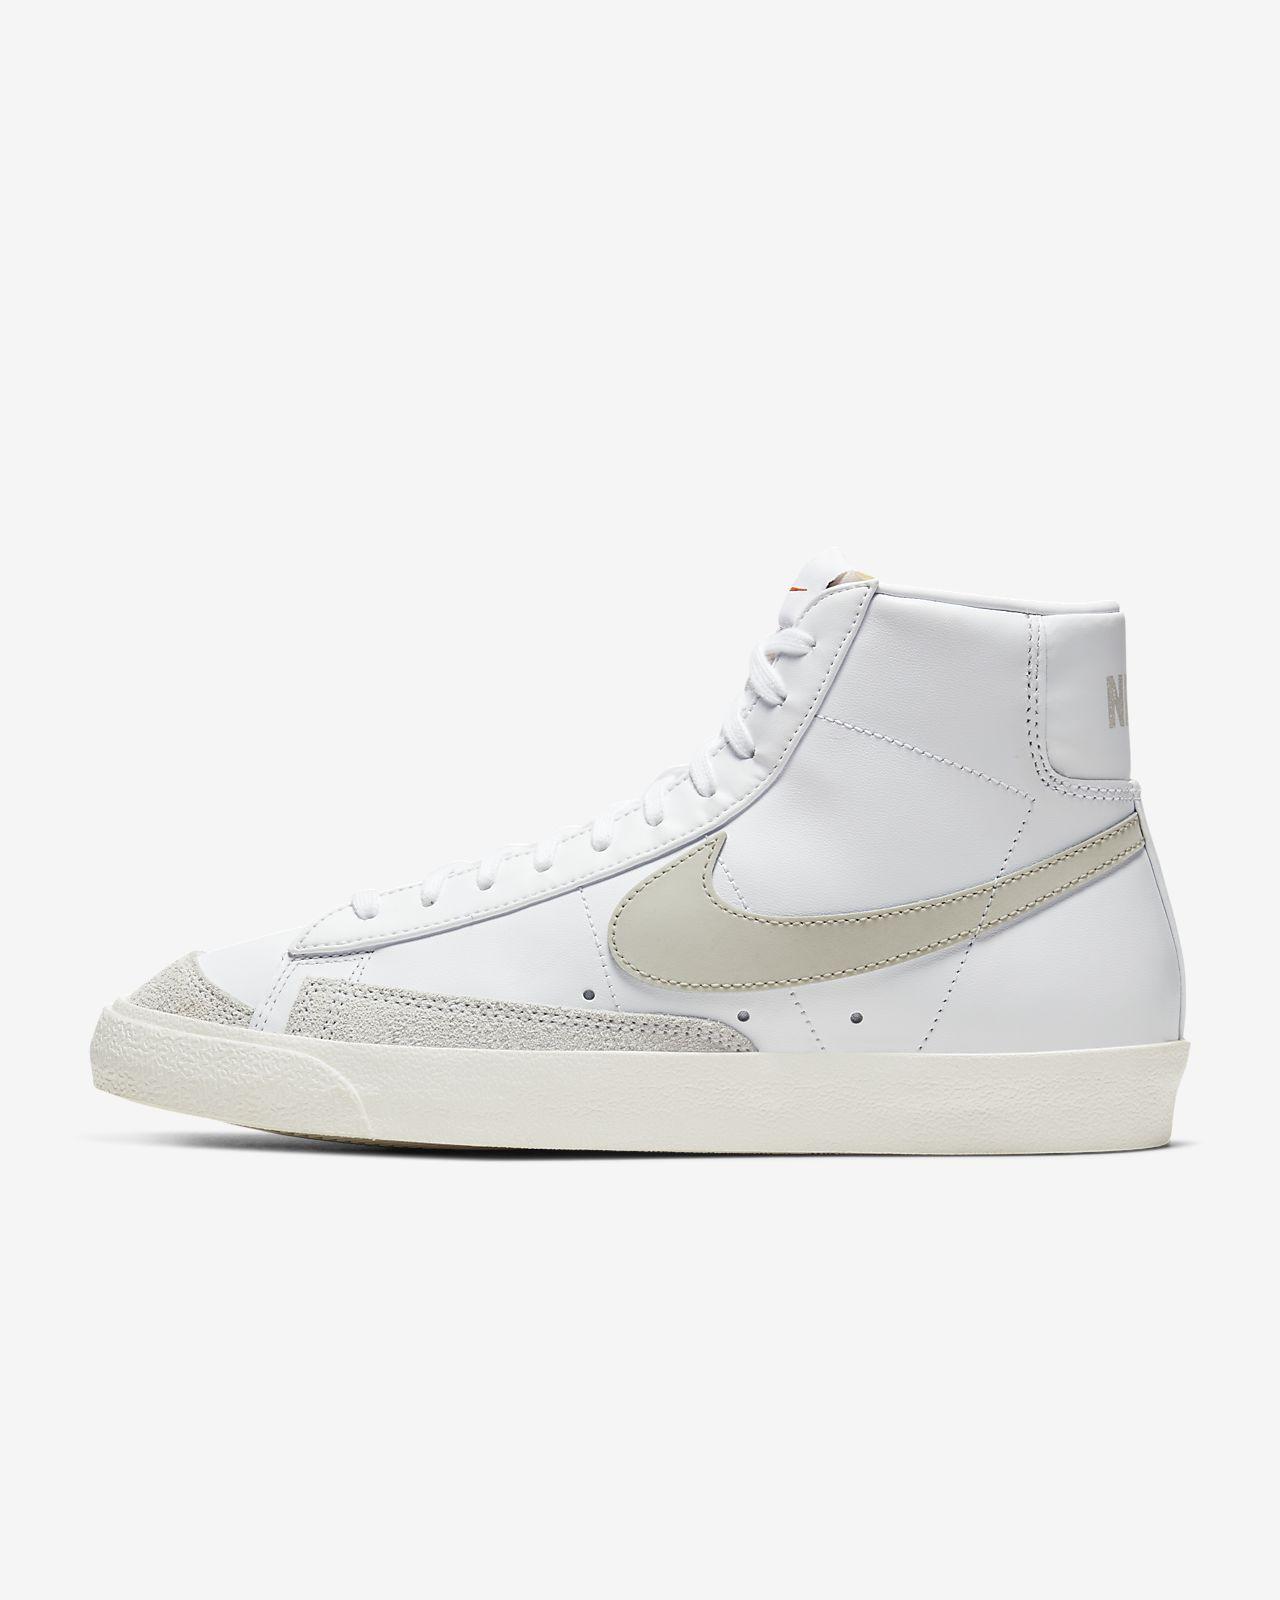 Nike Blazer Mid '77 Vintage Herrenschuh